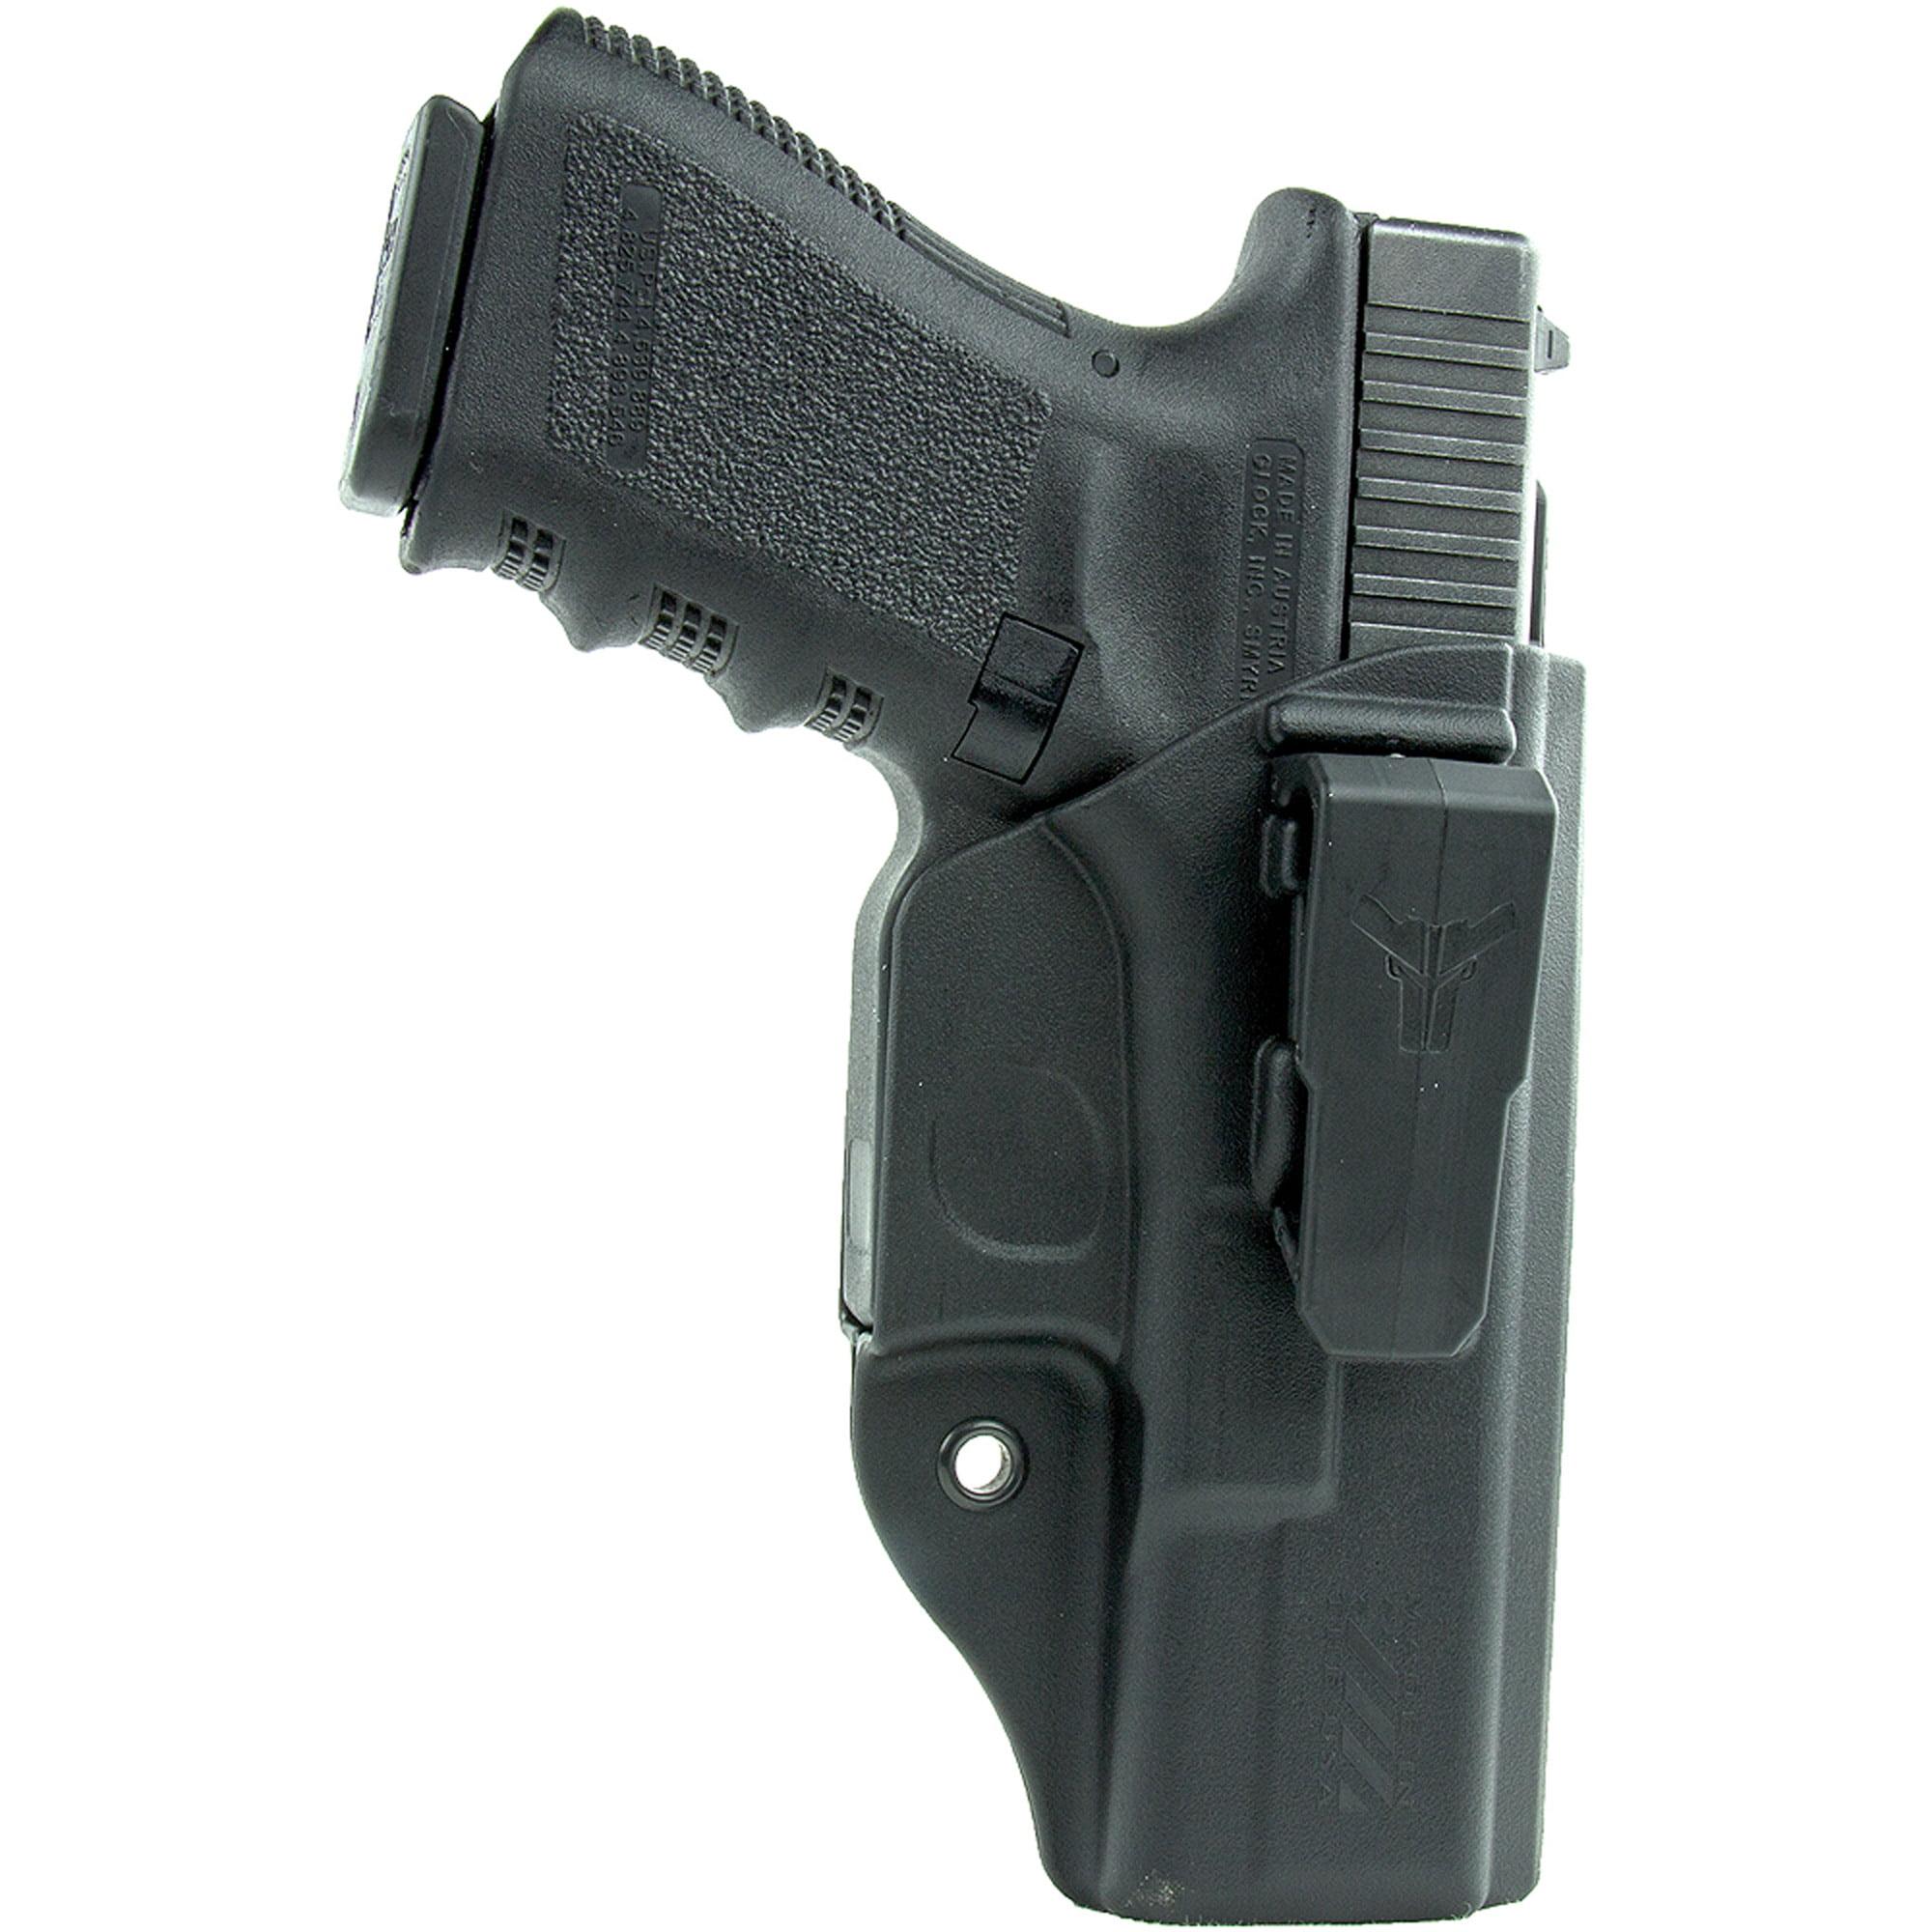 Blade Tech Industries Klipt Holster, Fits Glock 19 23 32, Right Hand, Black by Blade Tech Industries